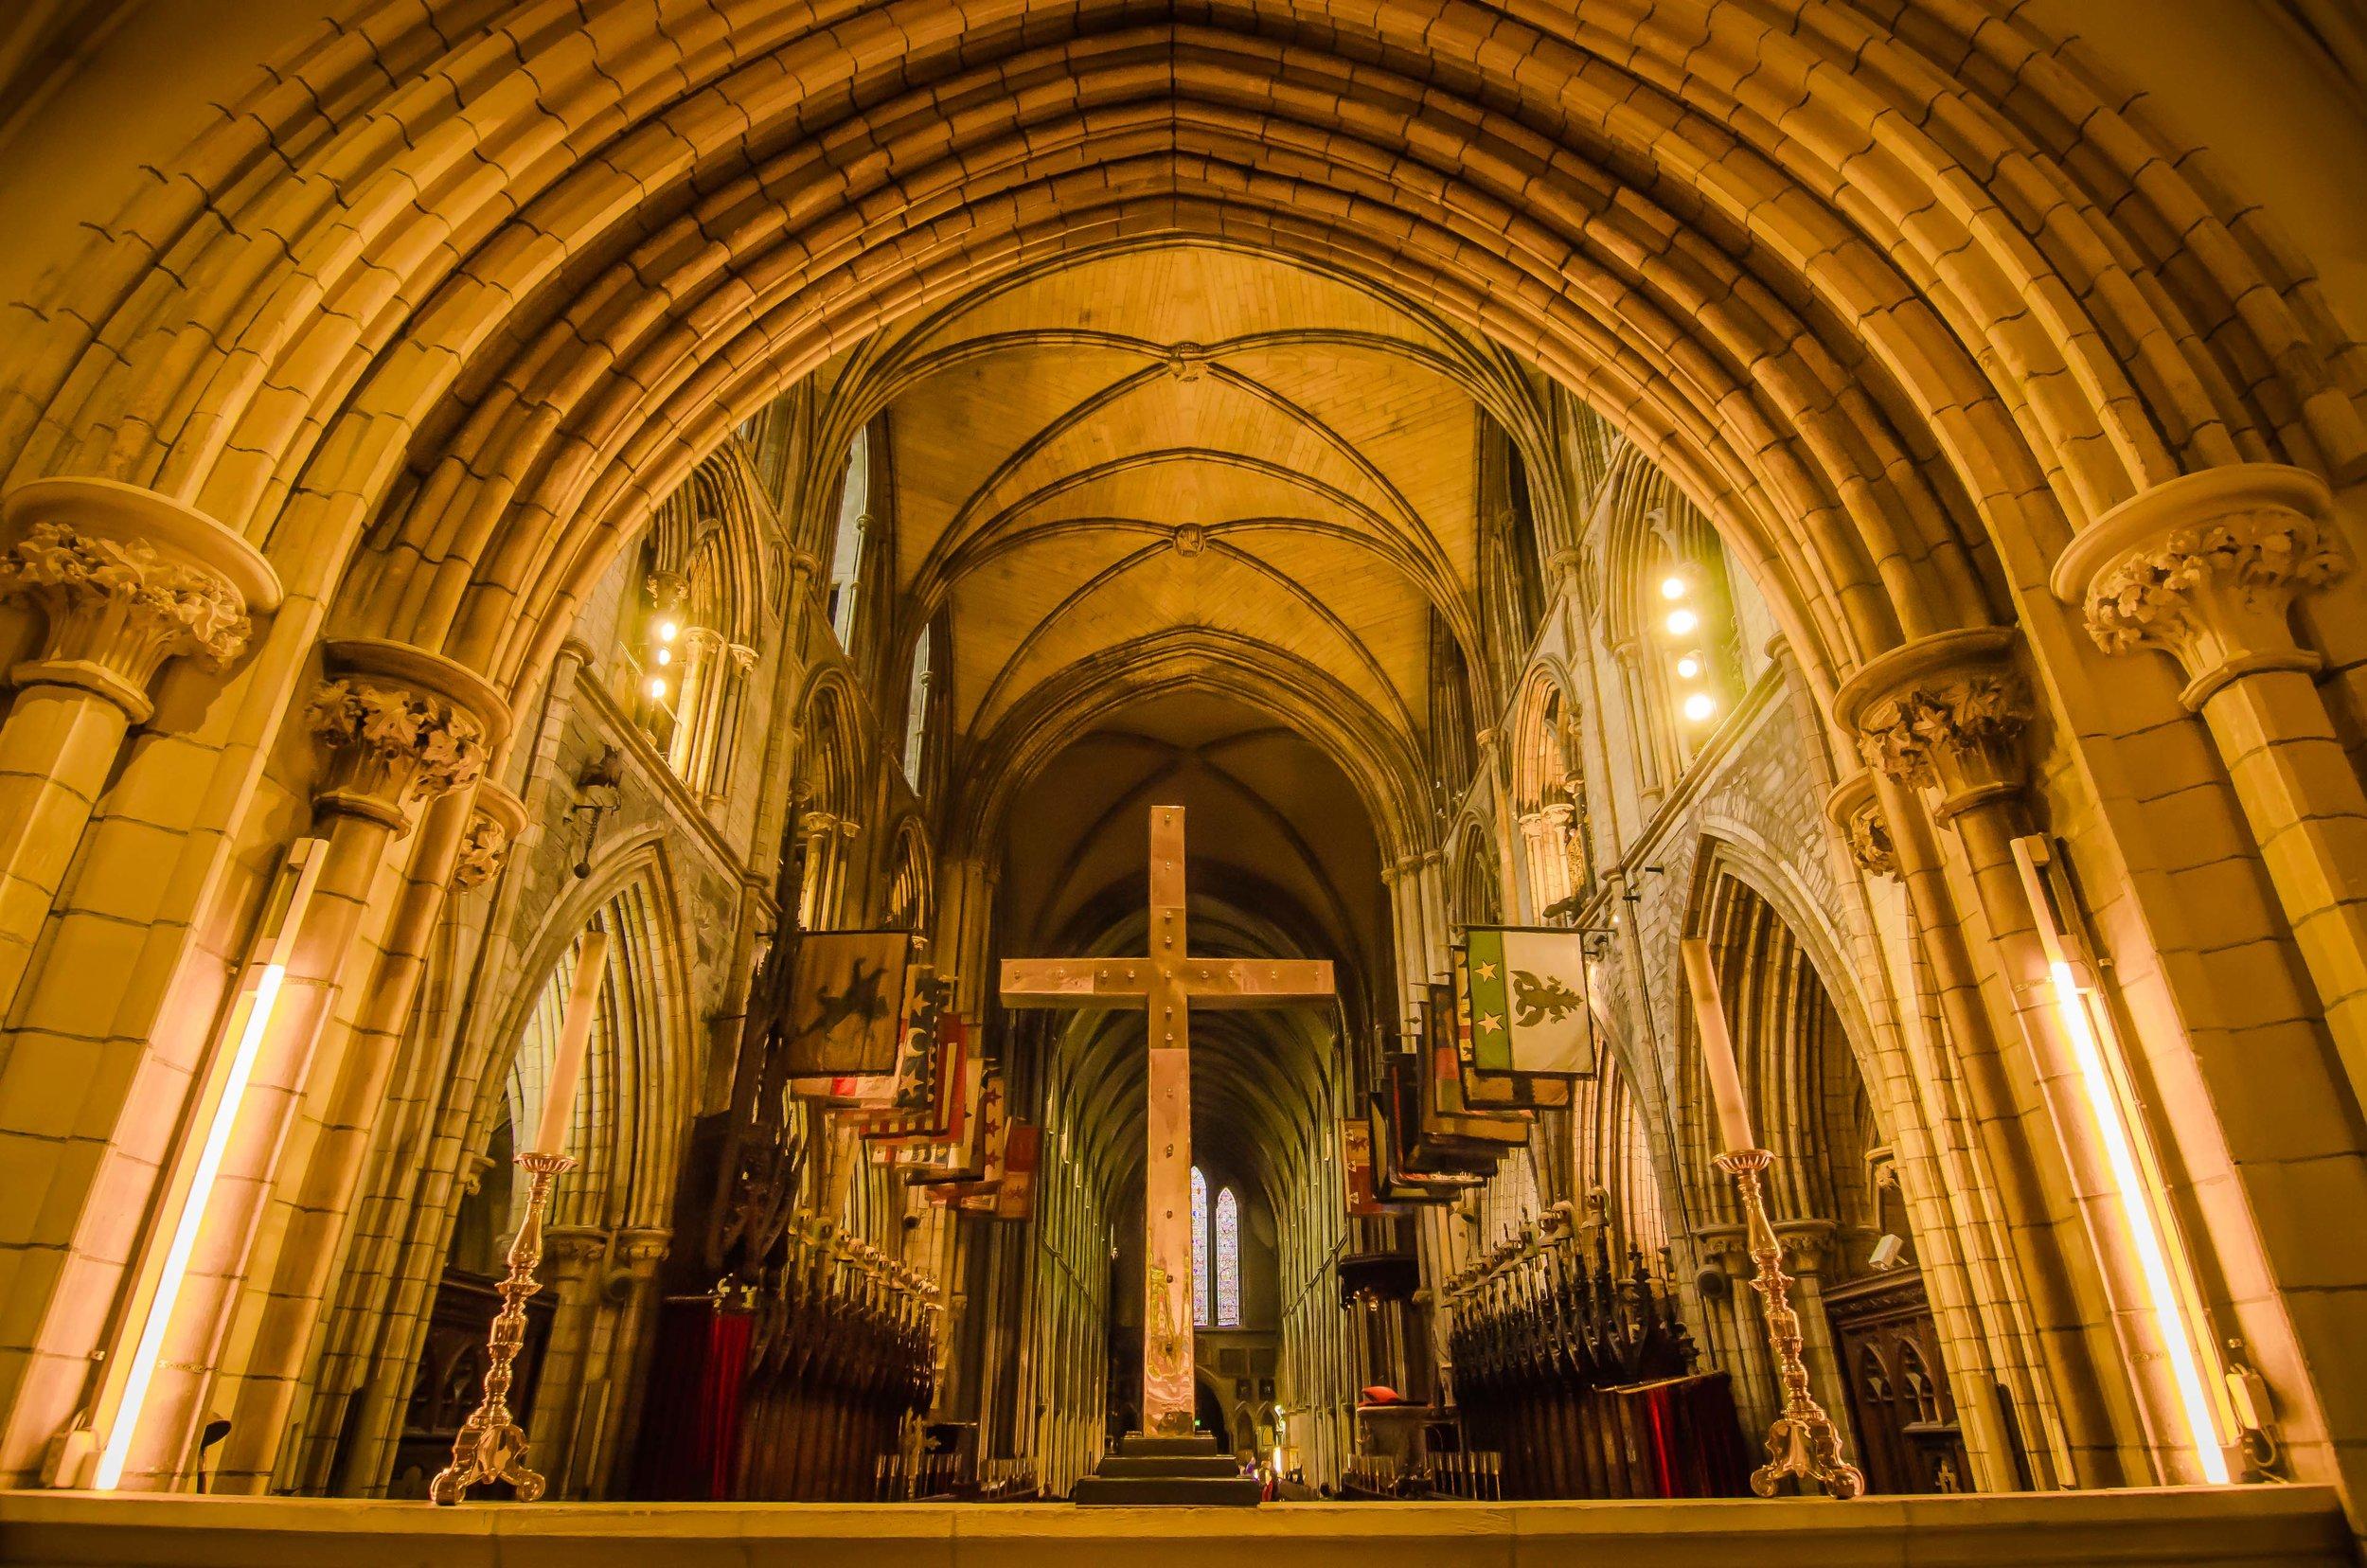 St. Patrick's Cathedral. Dublin, Ireland, 2015